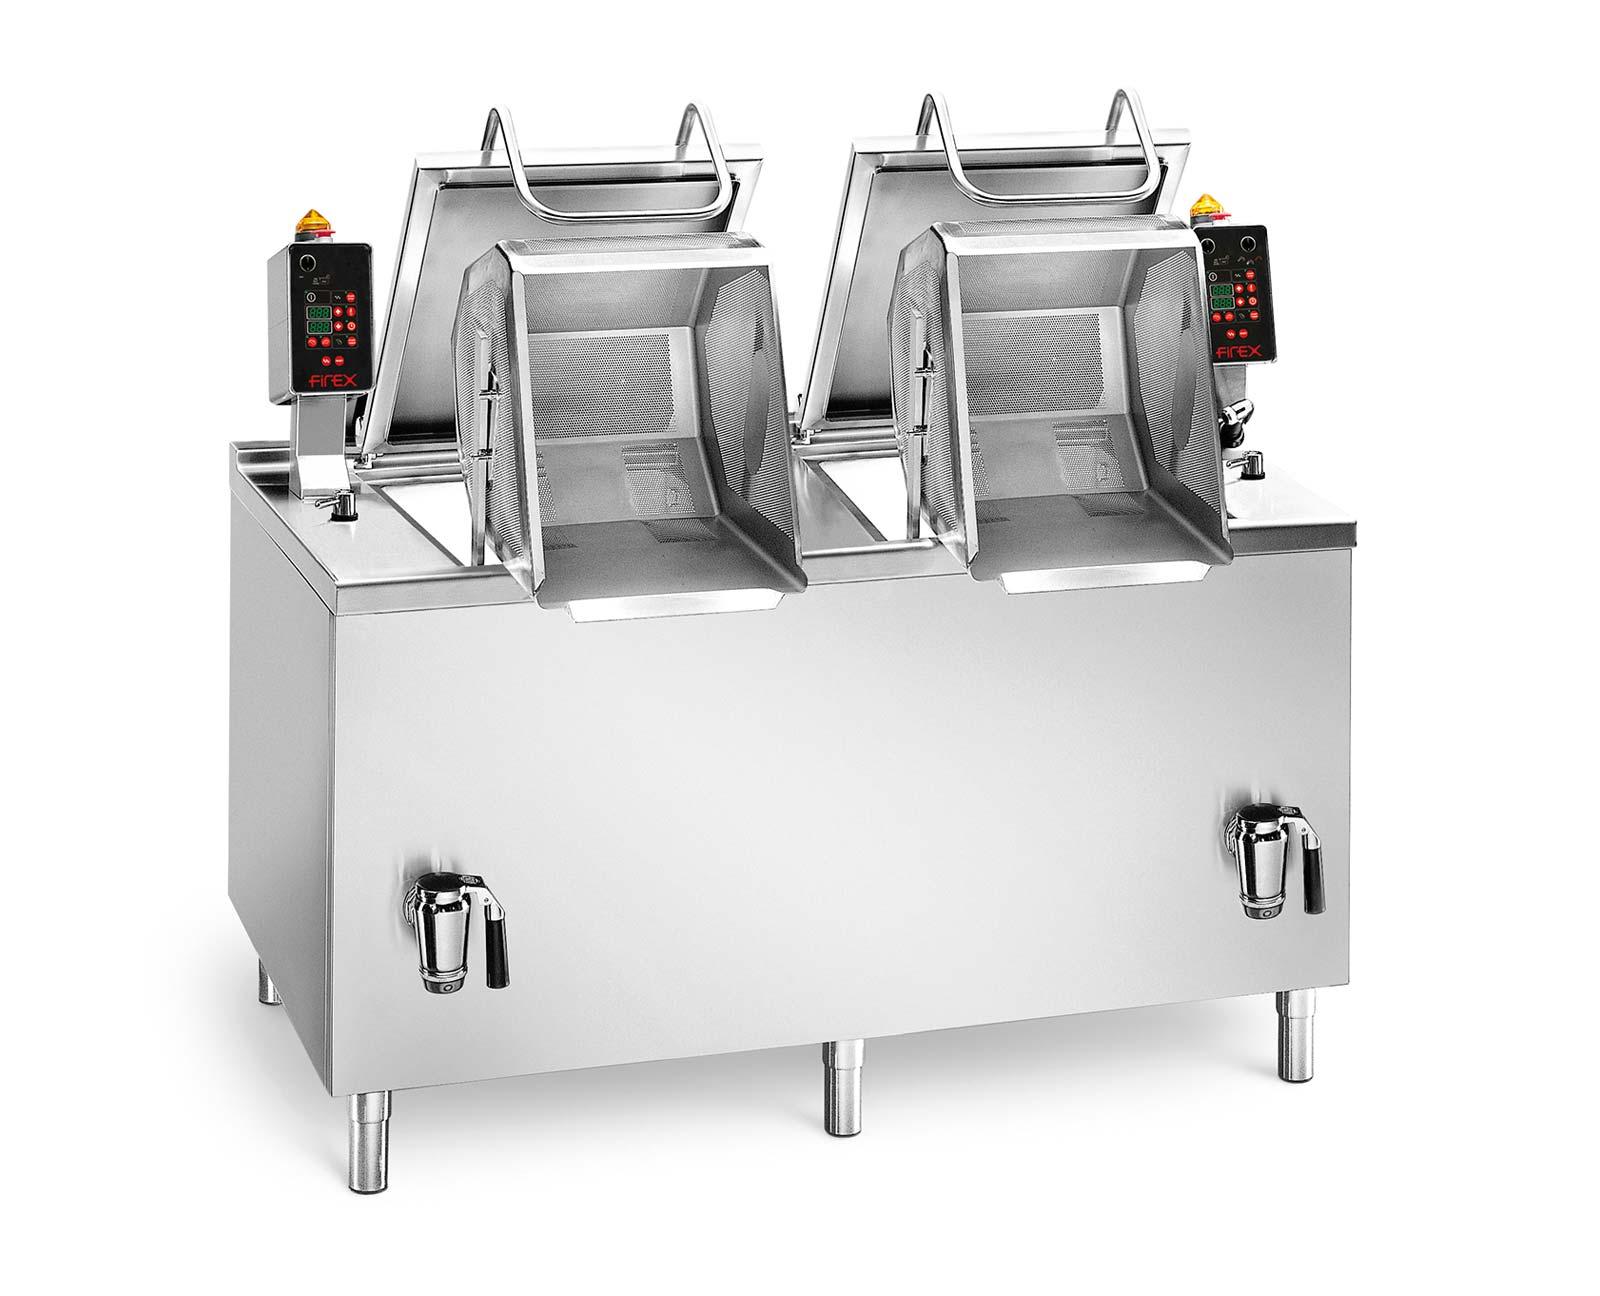 Firex Multicooker Nudelkocher Pastakocher mit 2 Körben